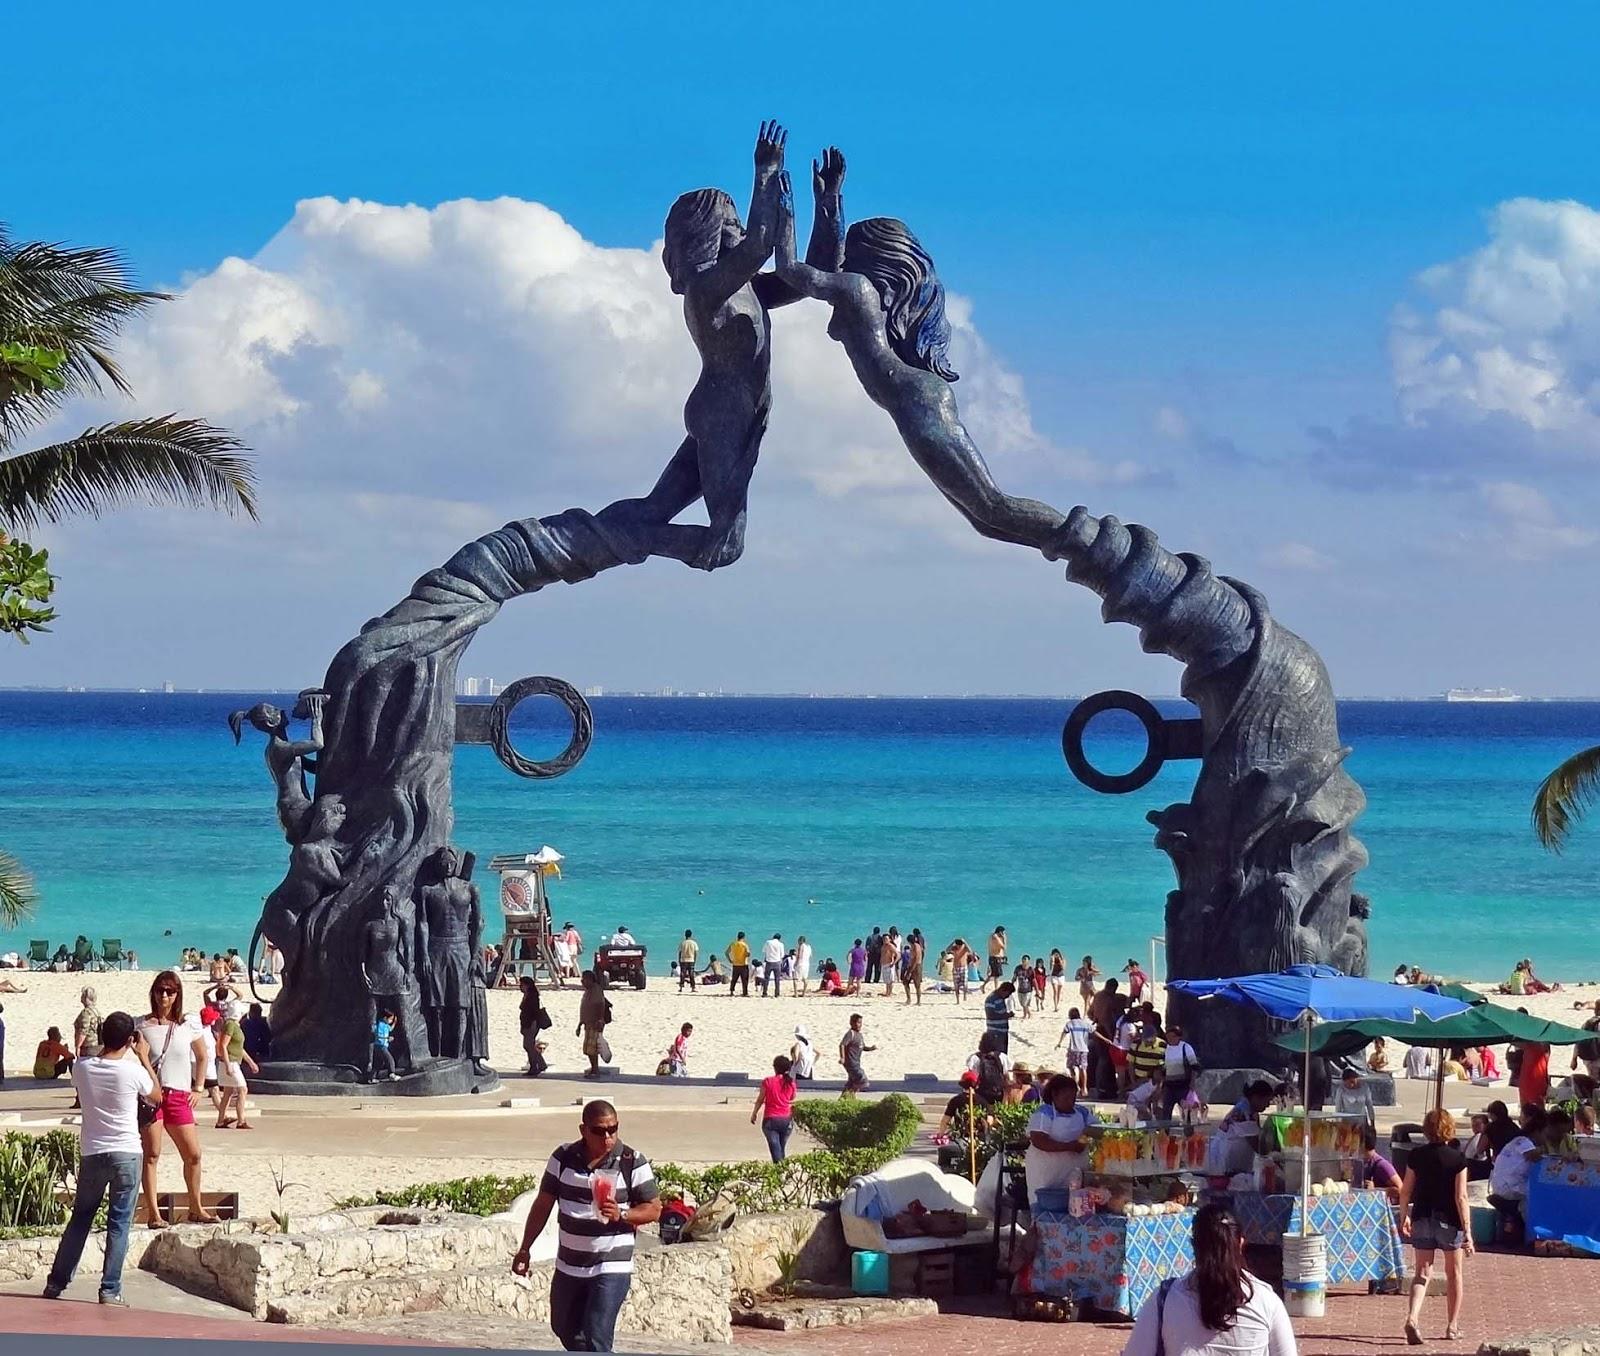 Joe S Retirement Blog Playa Del Carmen Quintana Roo